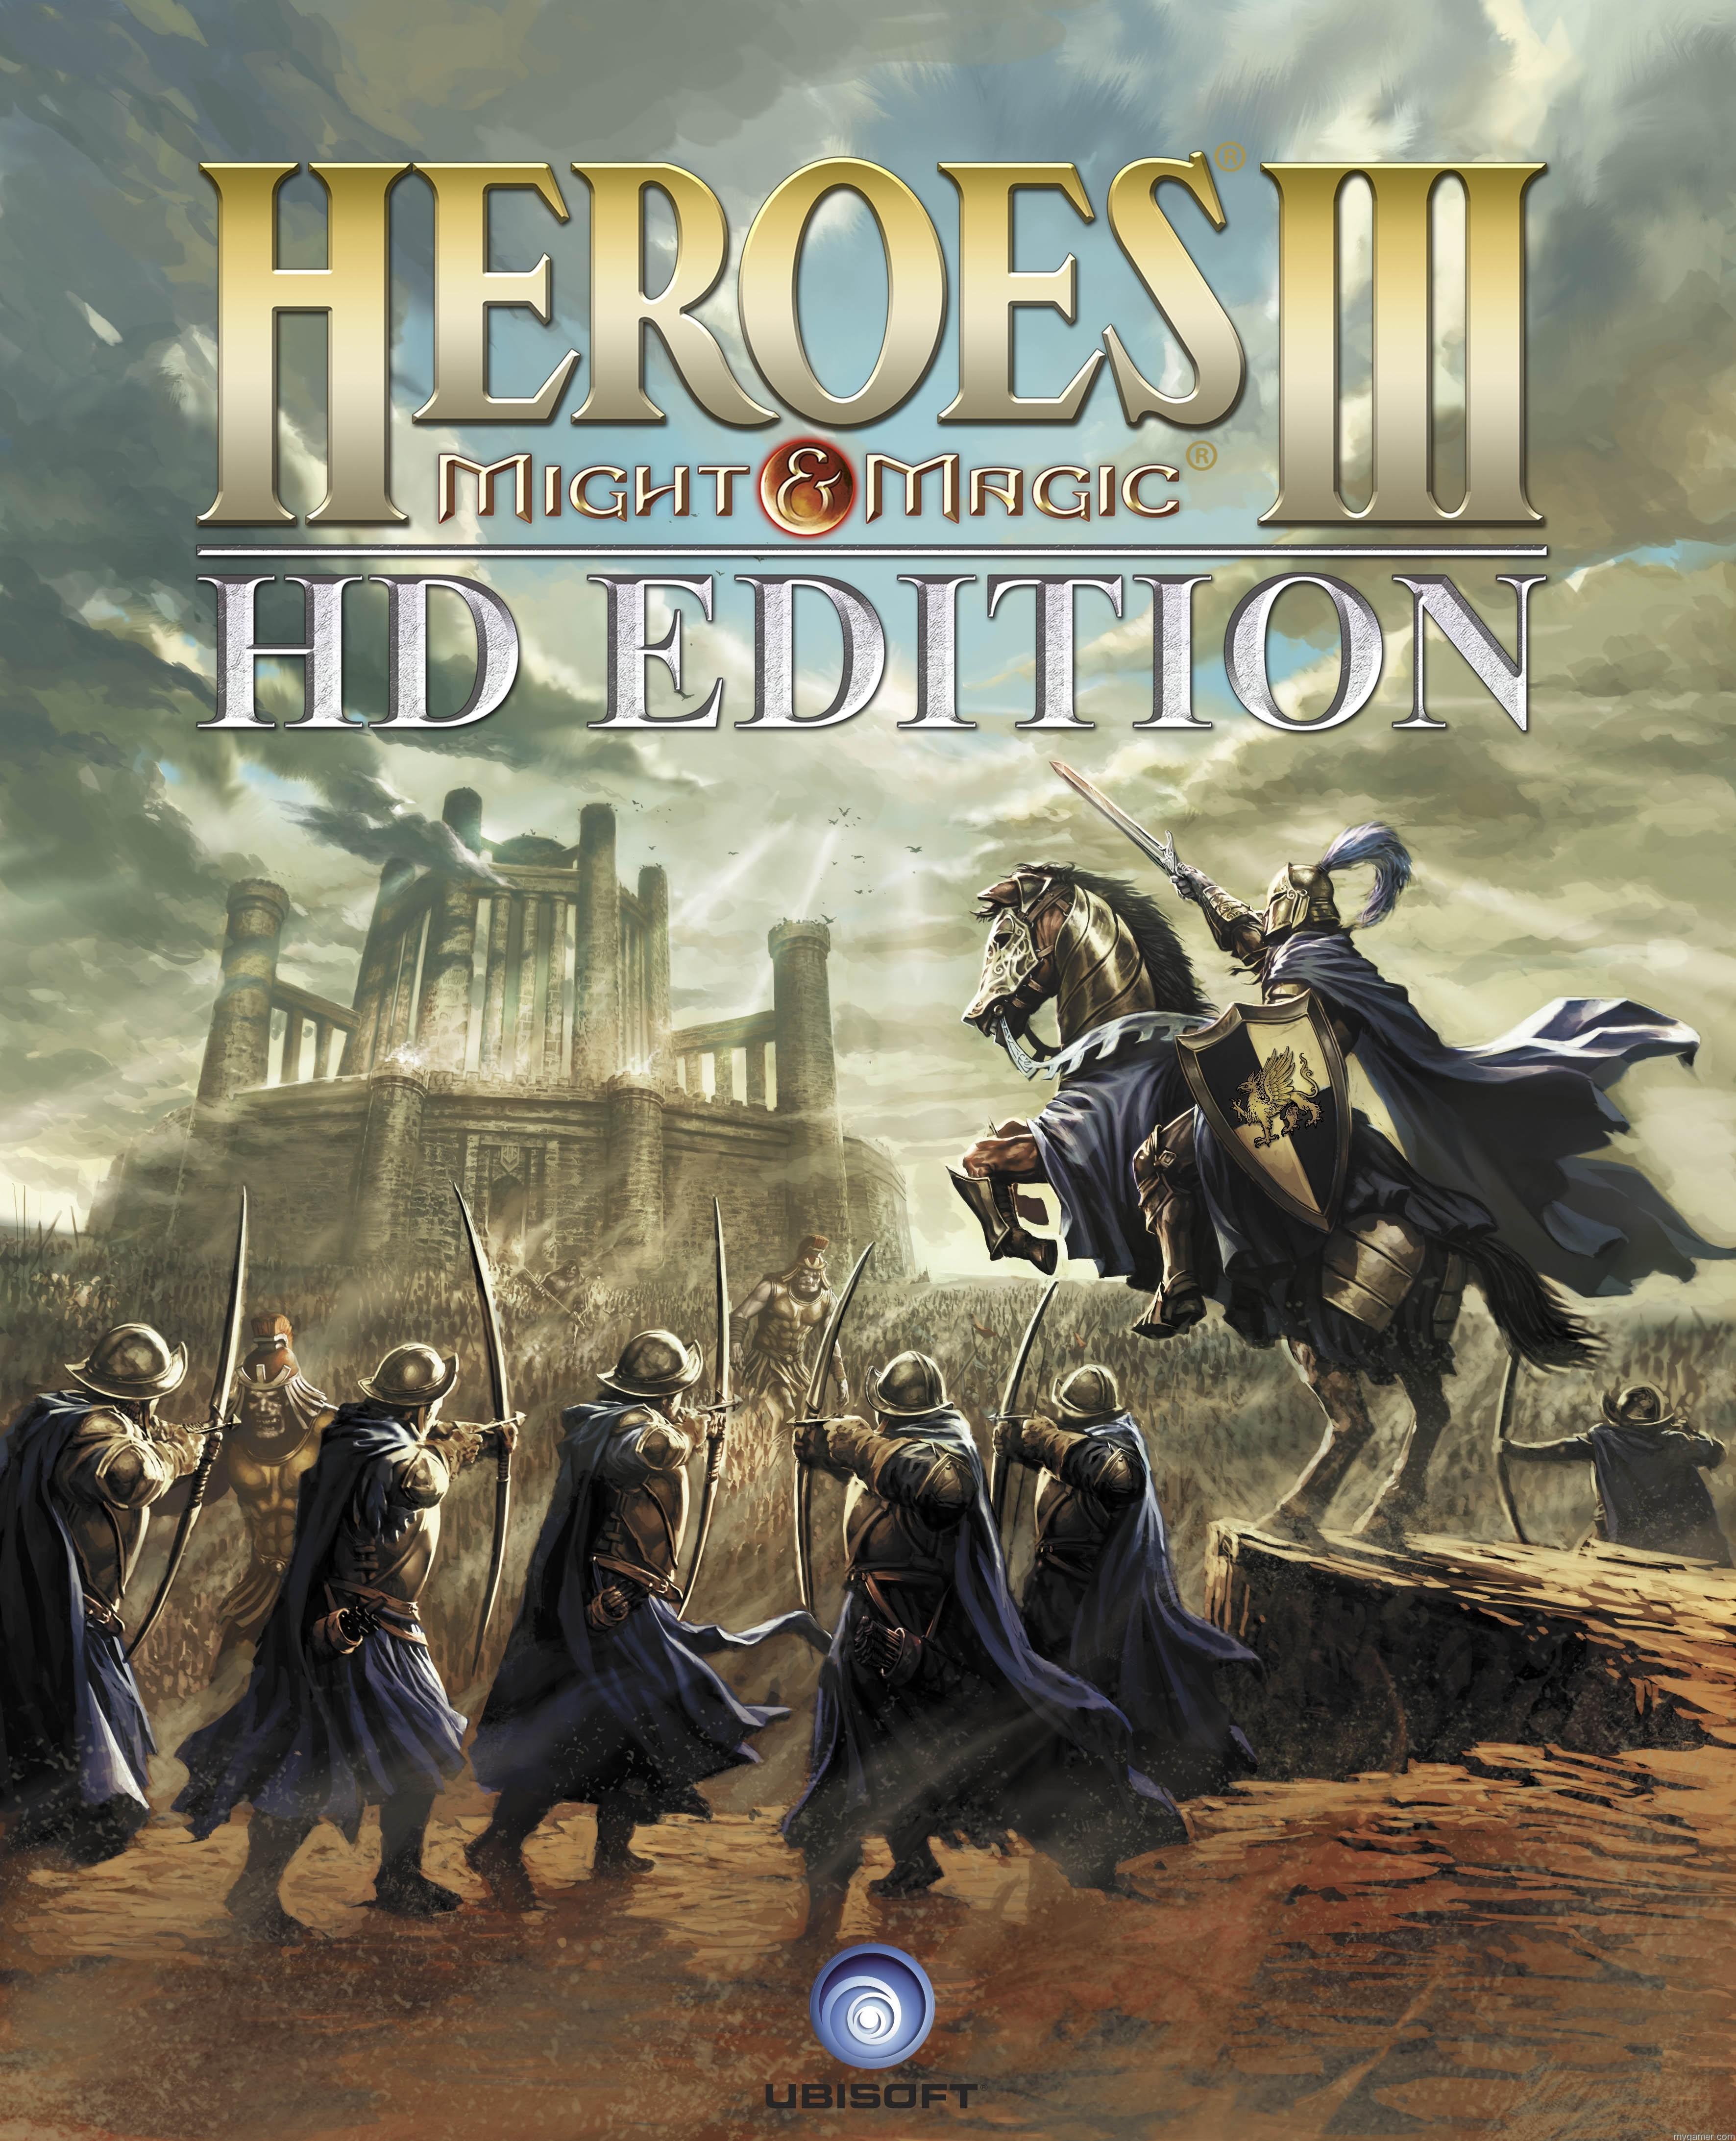 Heroes of Might & Magic III Gets the HD Treatment on PC and Mobile Heroes of Might & Magic III Gets the HD Treatment on PC and Mobile Heroes of Might and Magic III HD banner